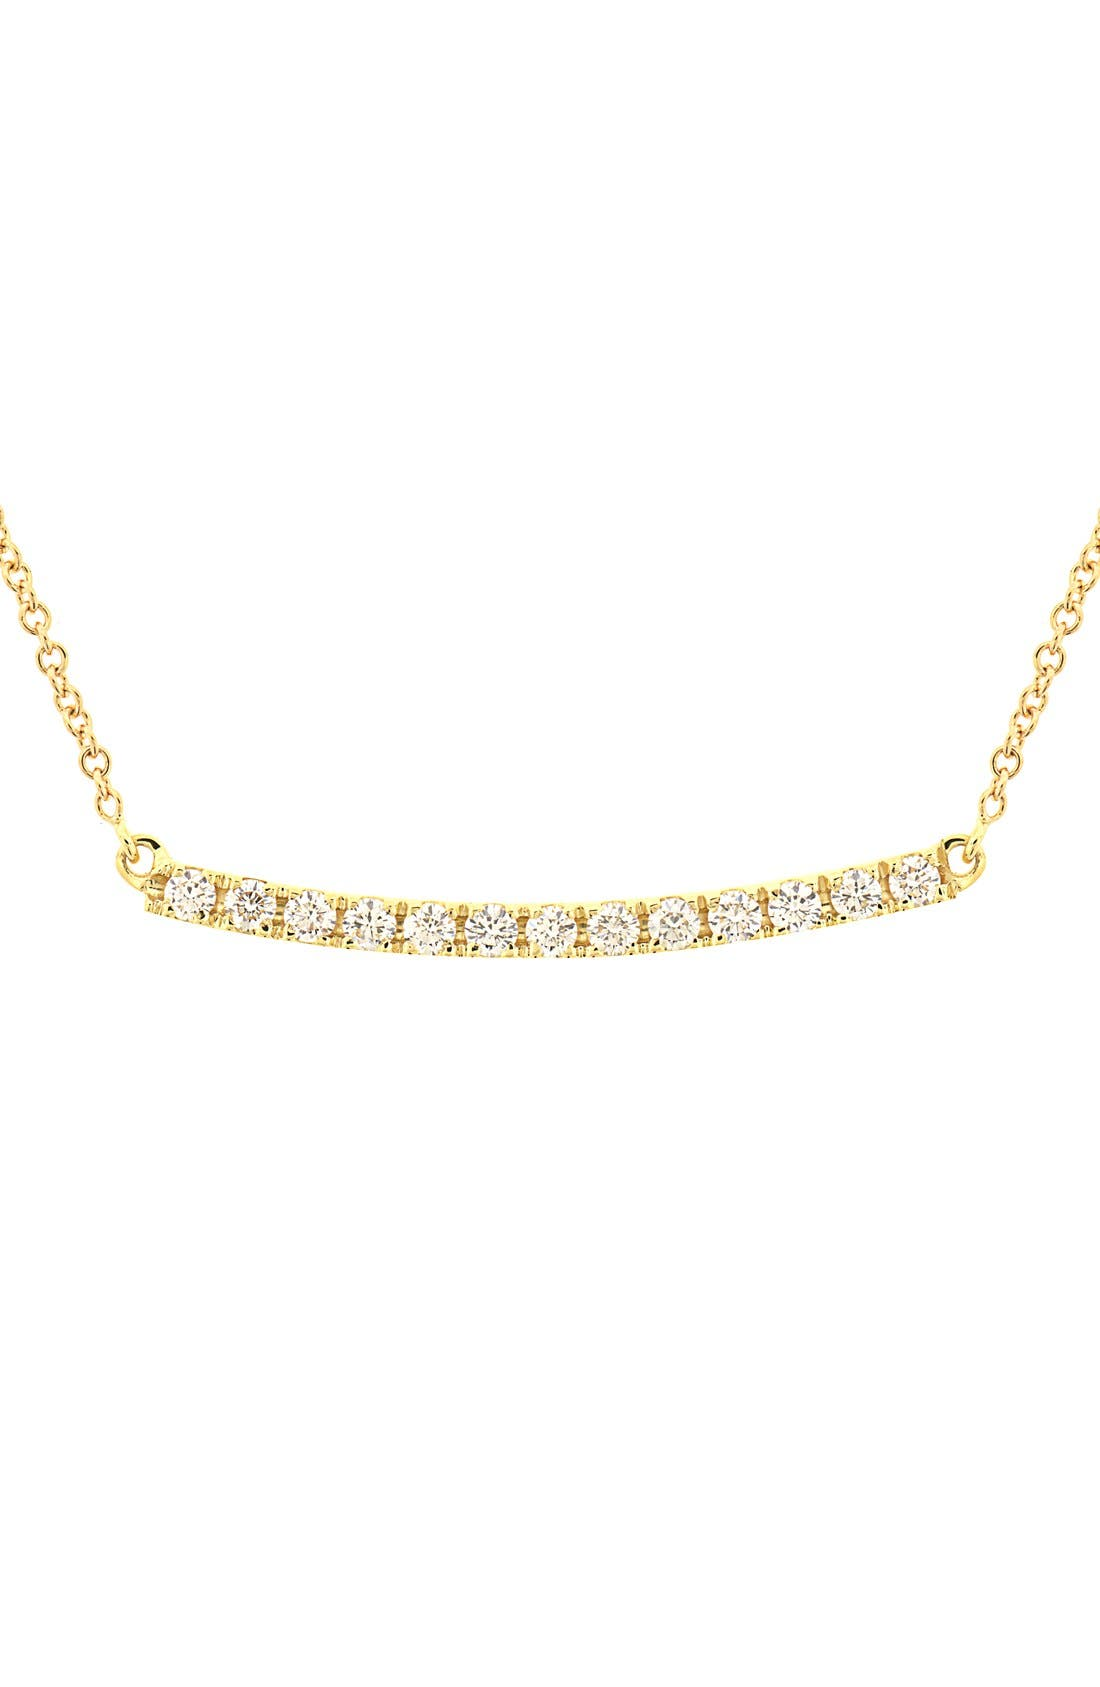 Alternate Image 1 Selected - Bony Levy 'Stick' Pavé Diamond Bar Necklace (Nordstrom Exclusive)